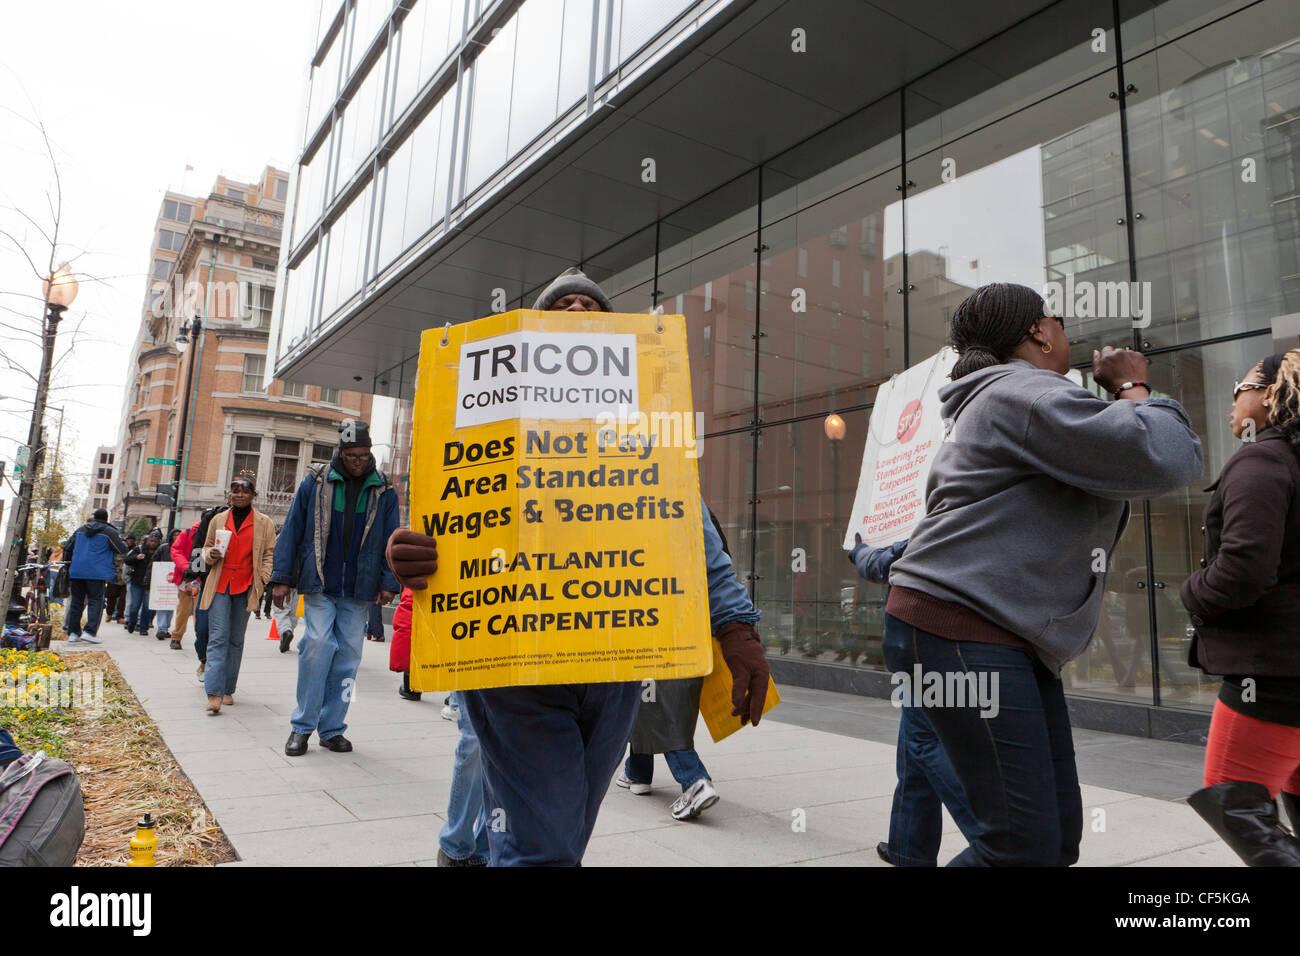 Carpenters on strike - Stock Image